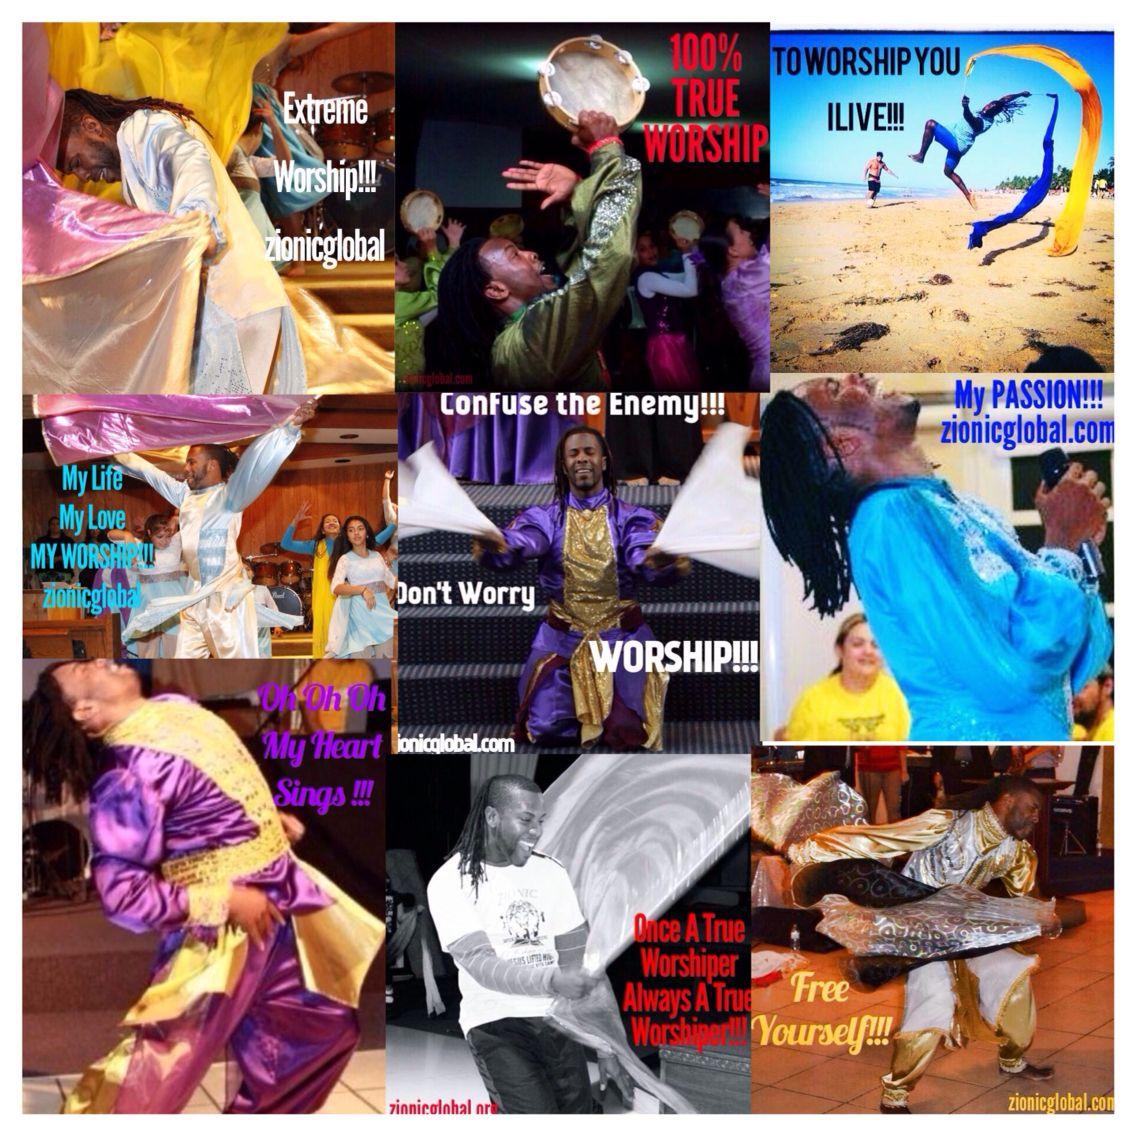 Praise Is What I Do Www 4everpraise Com Www Zionicglobal Weebly Com Dance Praisedance 4everpraise Zionicin Praise Dance Dance Quotes Worship Meaning